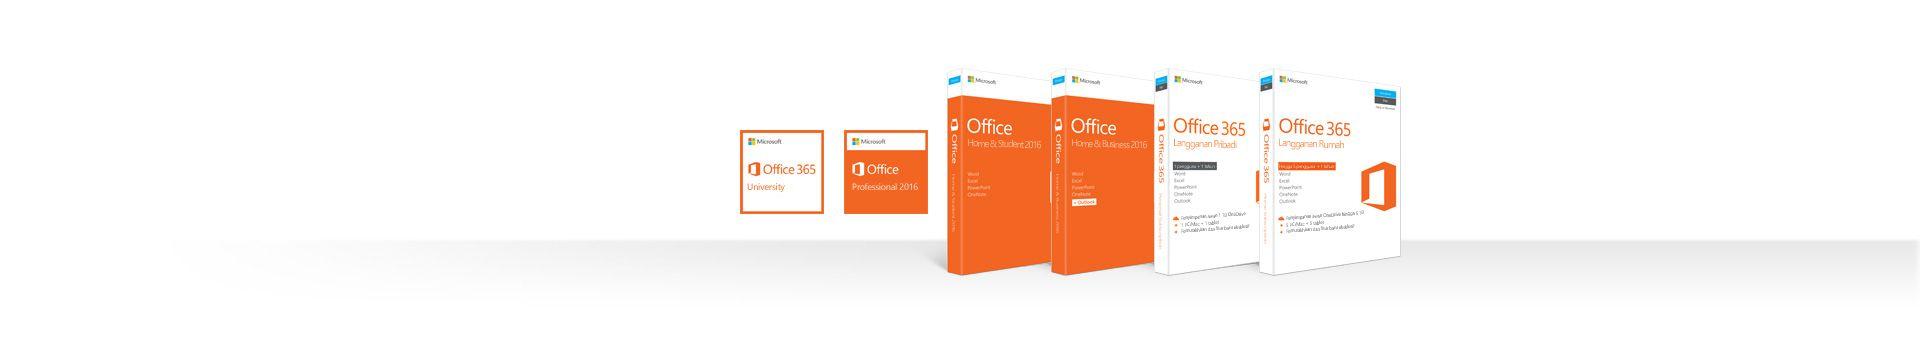 Sebaris kotak produk Office 2016 dan Office 365 untuk PC